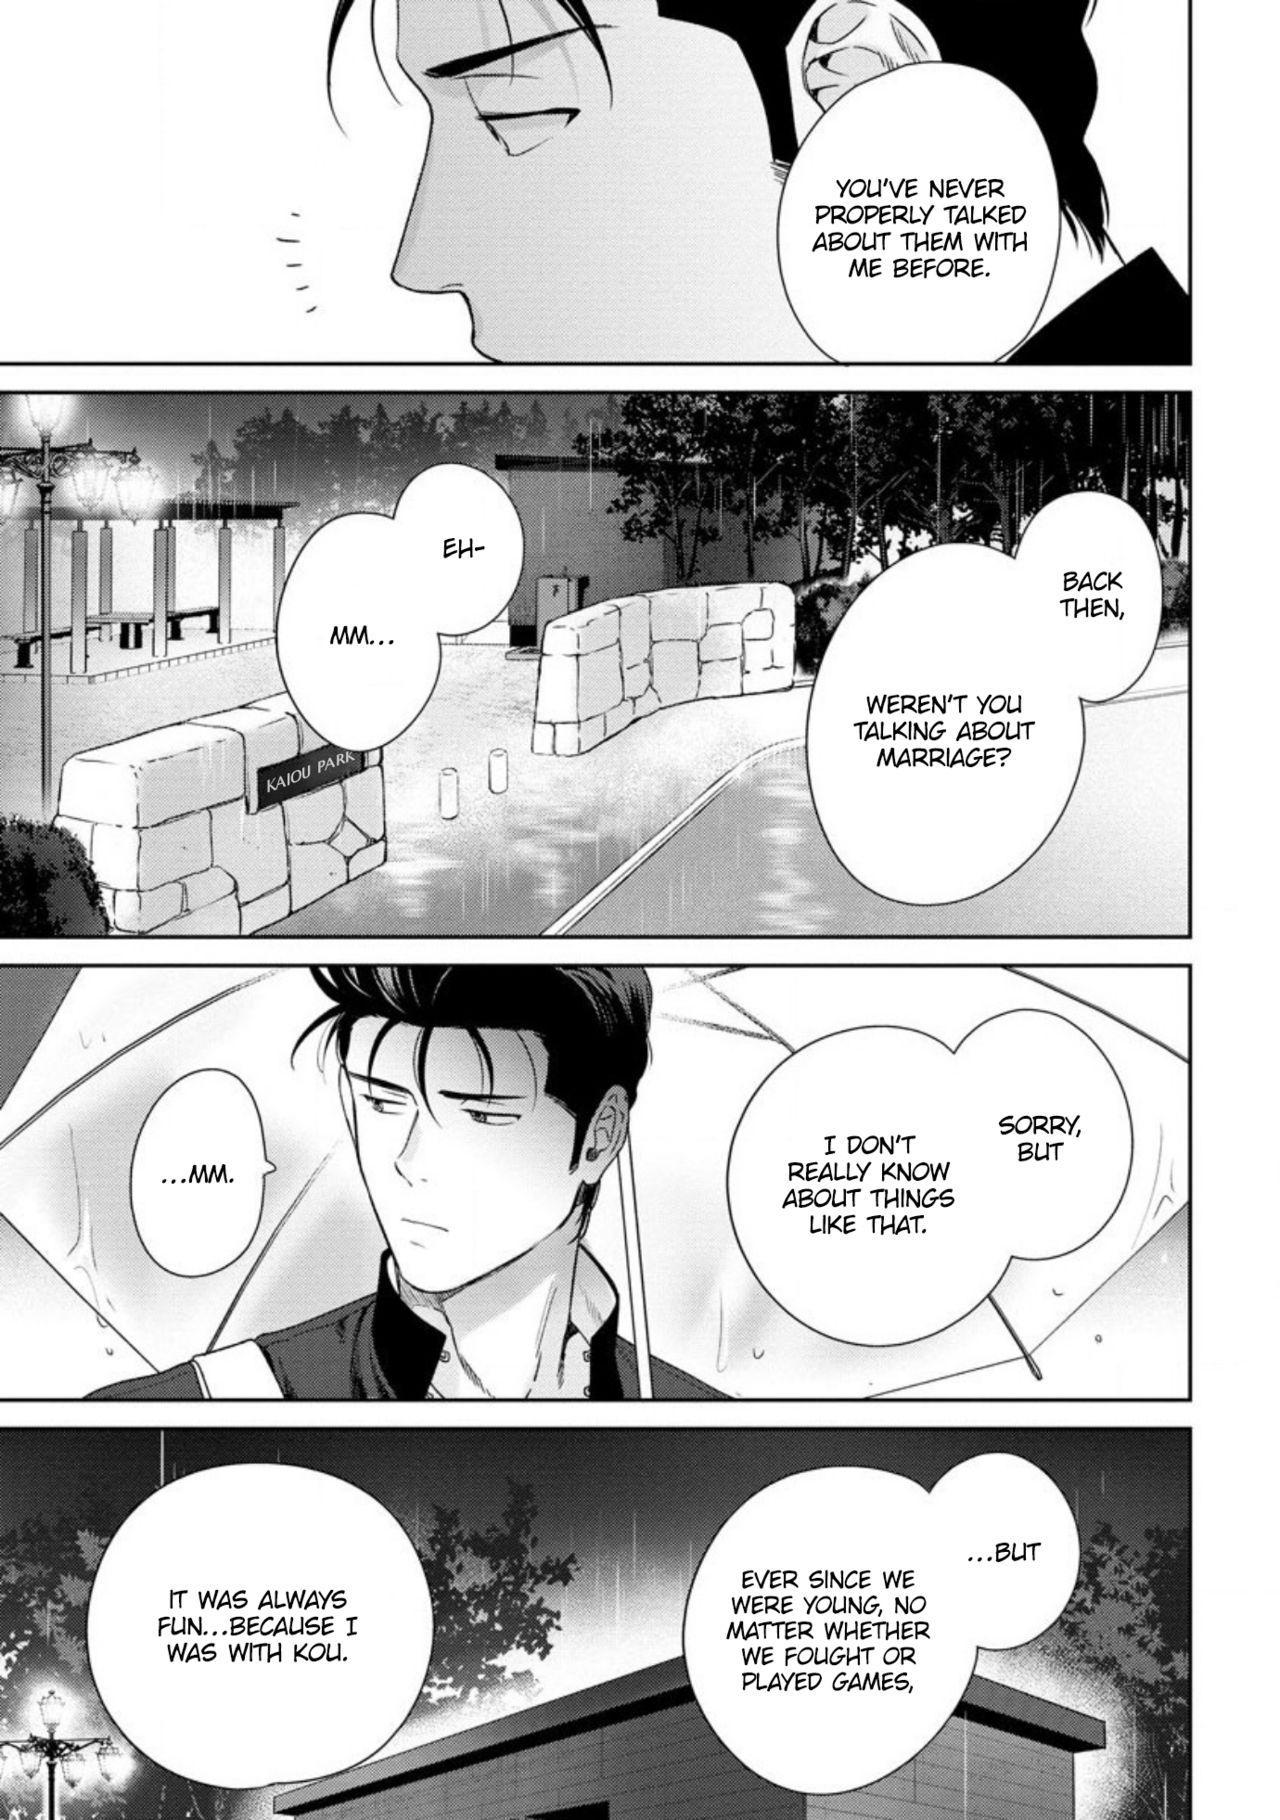 [Hiiragi Nozomu] Nakasete Yaru yo Yankee-kun   I'll Make You Cry Ch. 1-5 + Extras [English] [Digital] 171